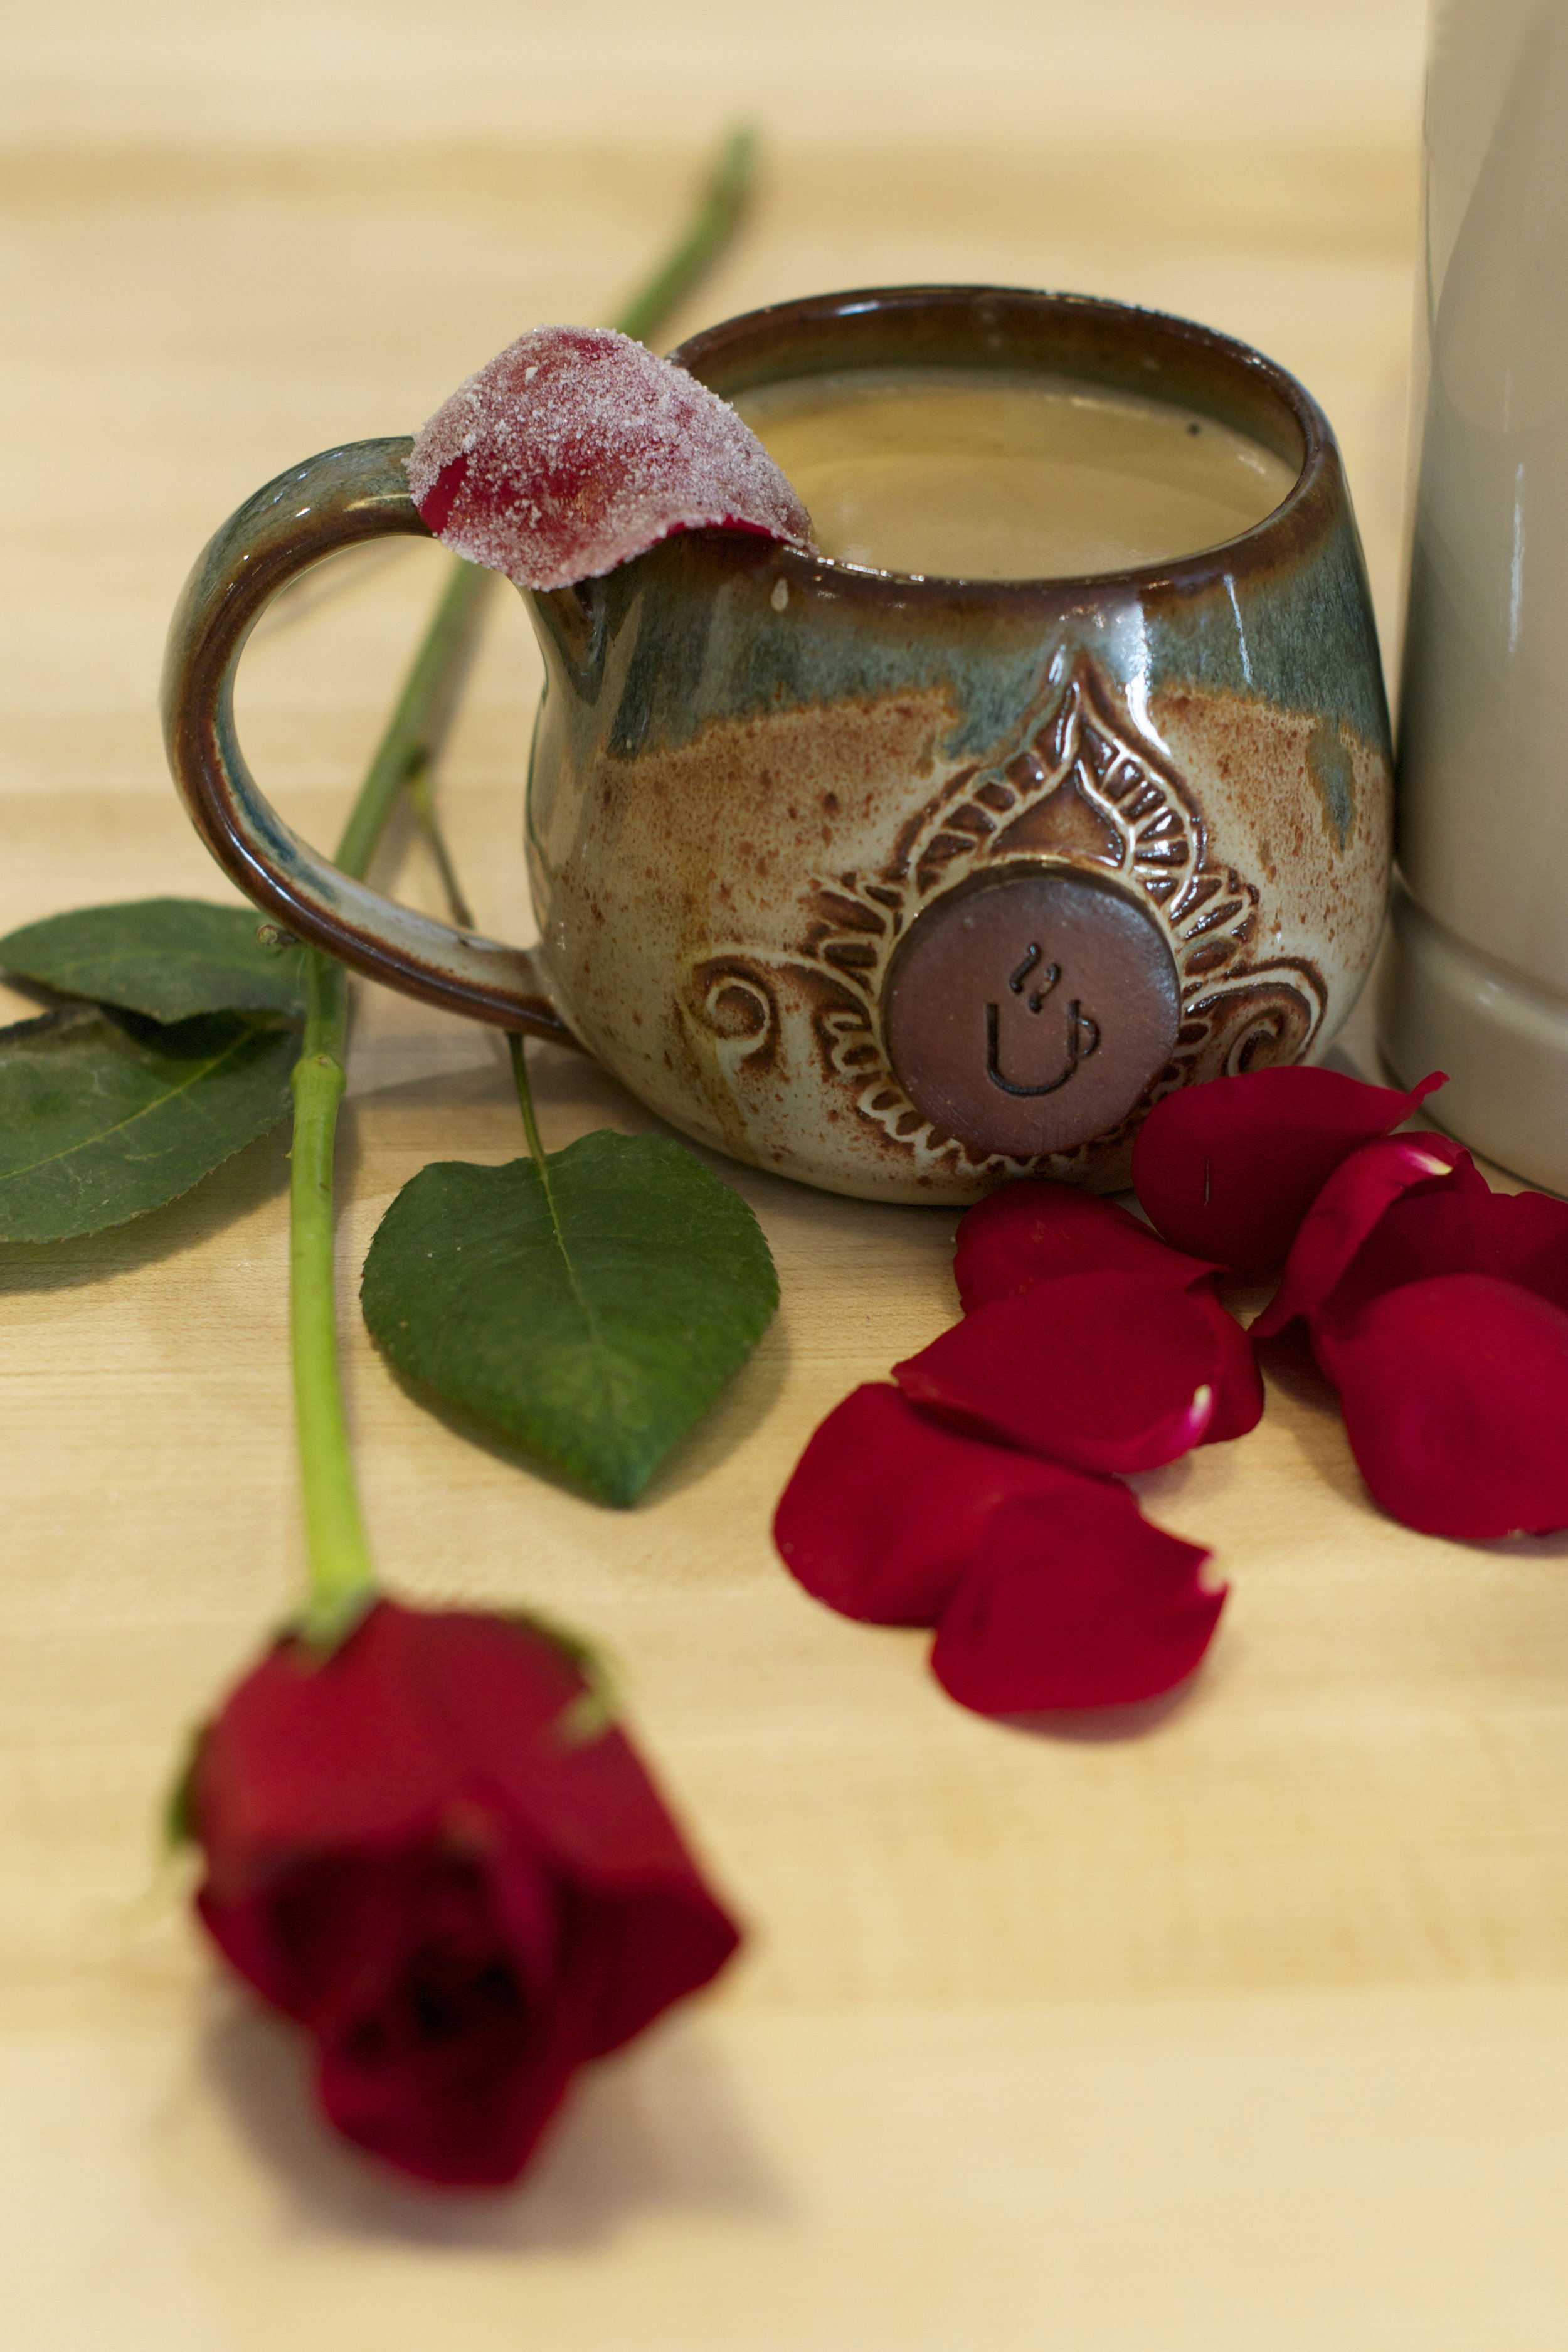 rose-latte-vertical-shot.jpg